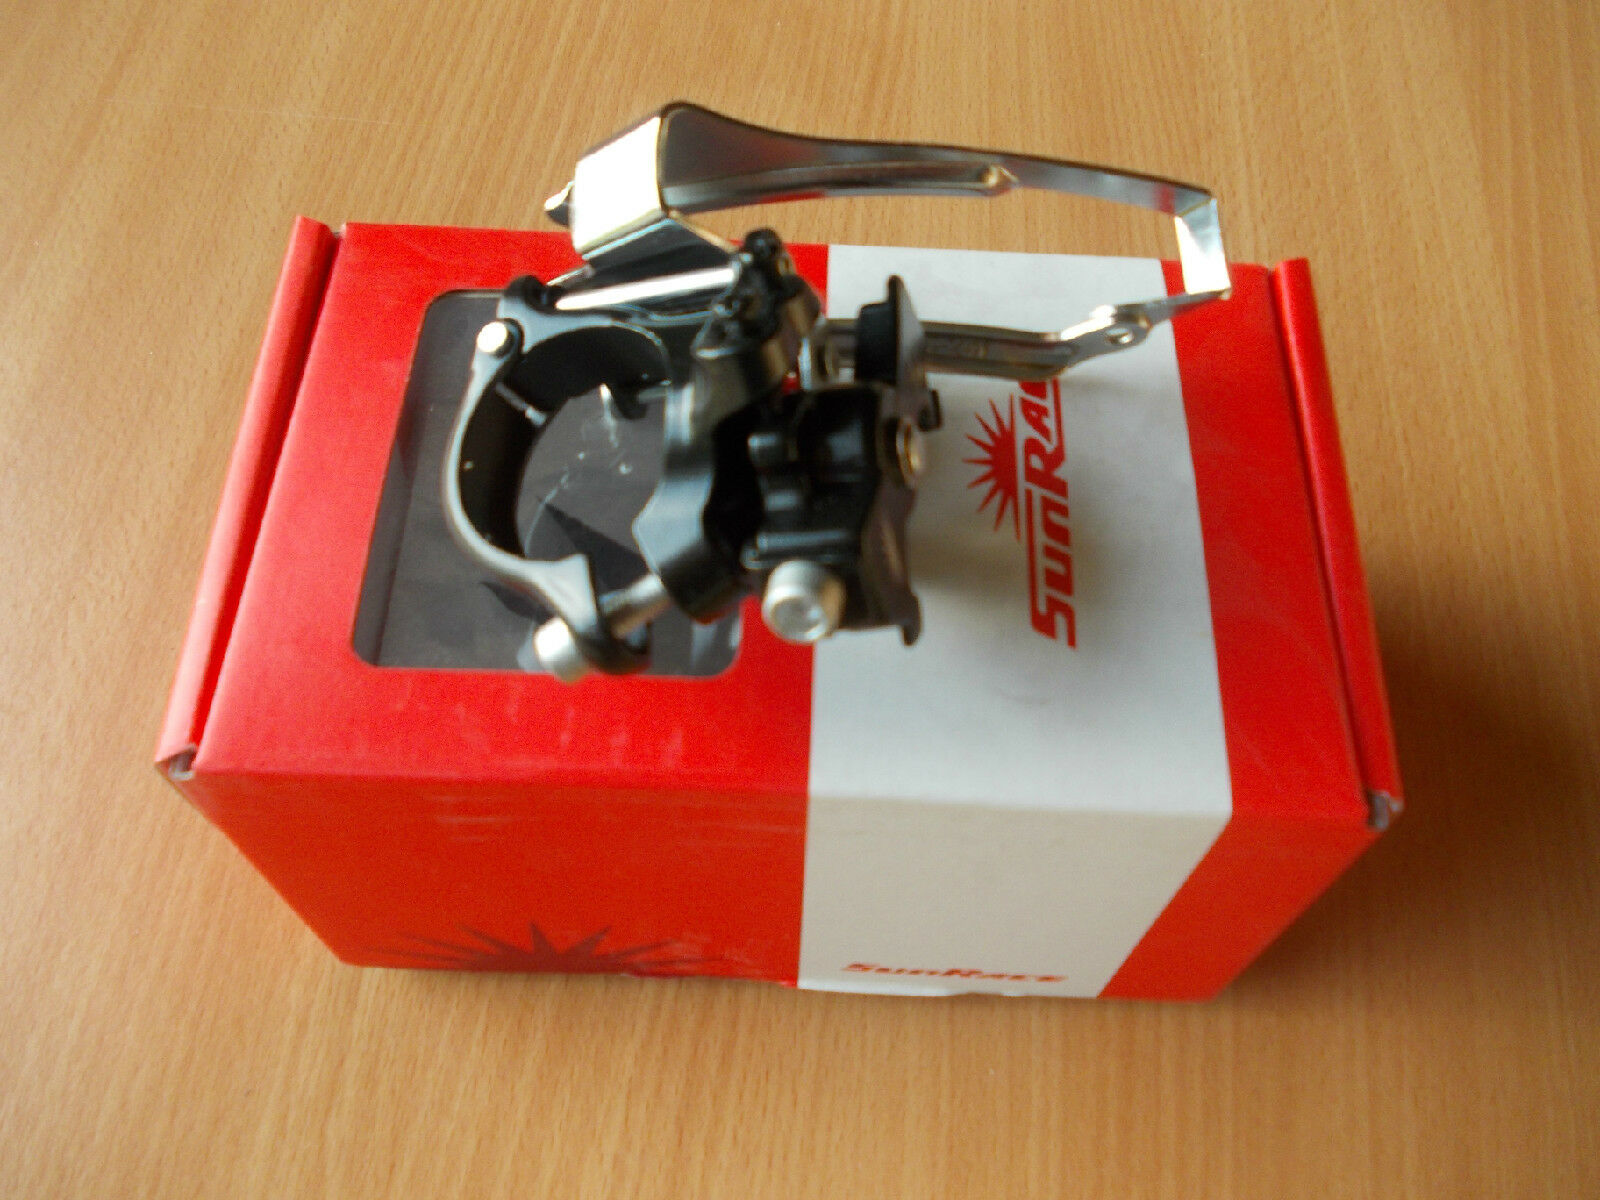 Ciclo Sunrace doble Pull Desviador Delantero Mech 31.8 o 34.9mm Marco Tamaño